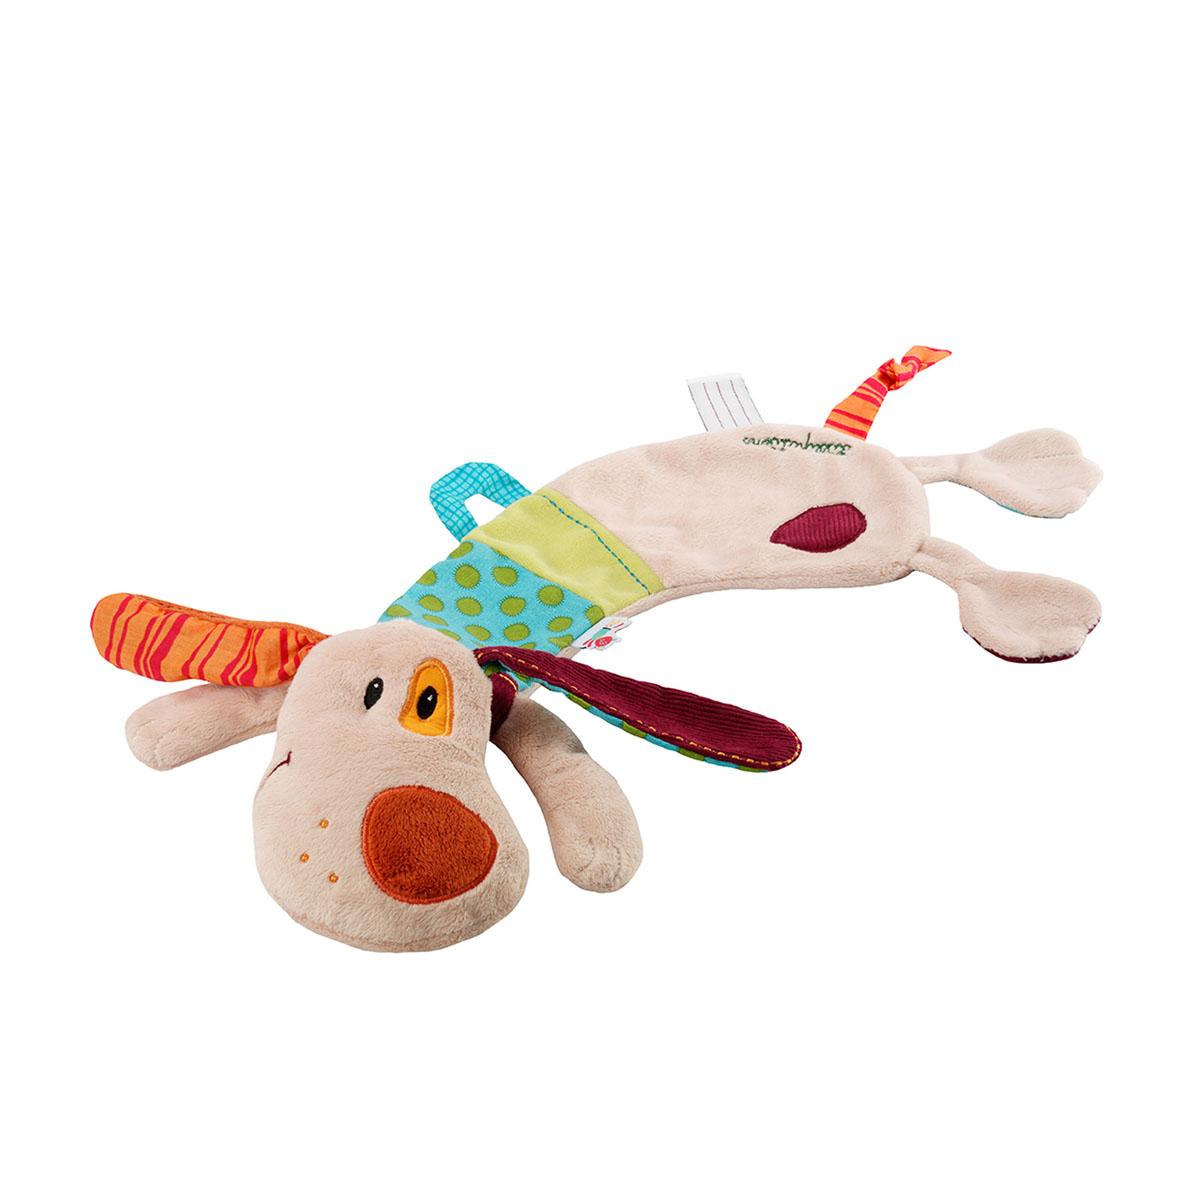 Lilliputiens Игрушка-обнимашка Собачка Джеф lilliputiens курочка офелия музыкальная игрушка